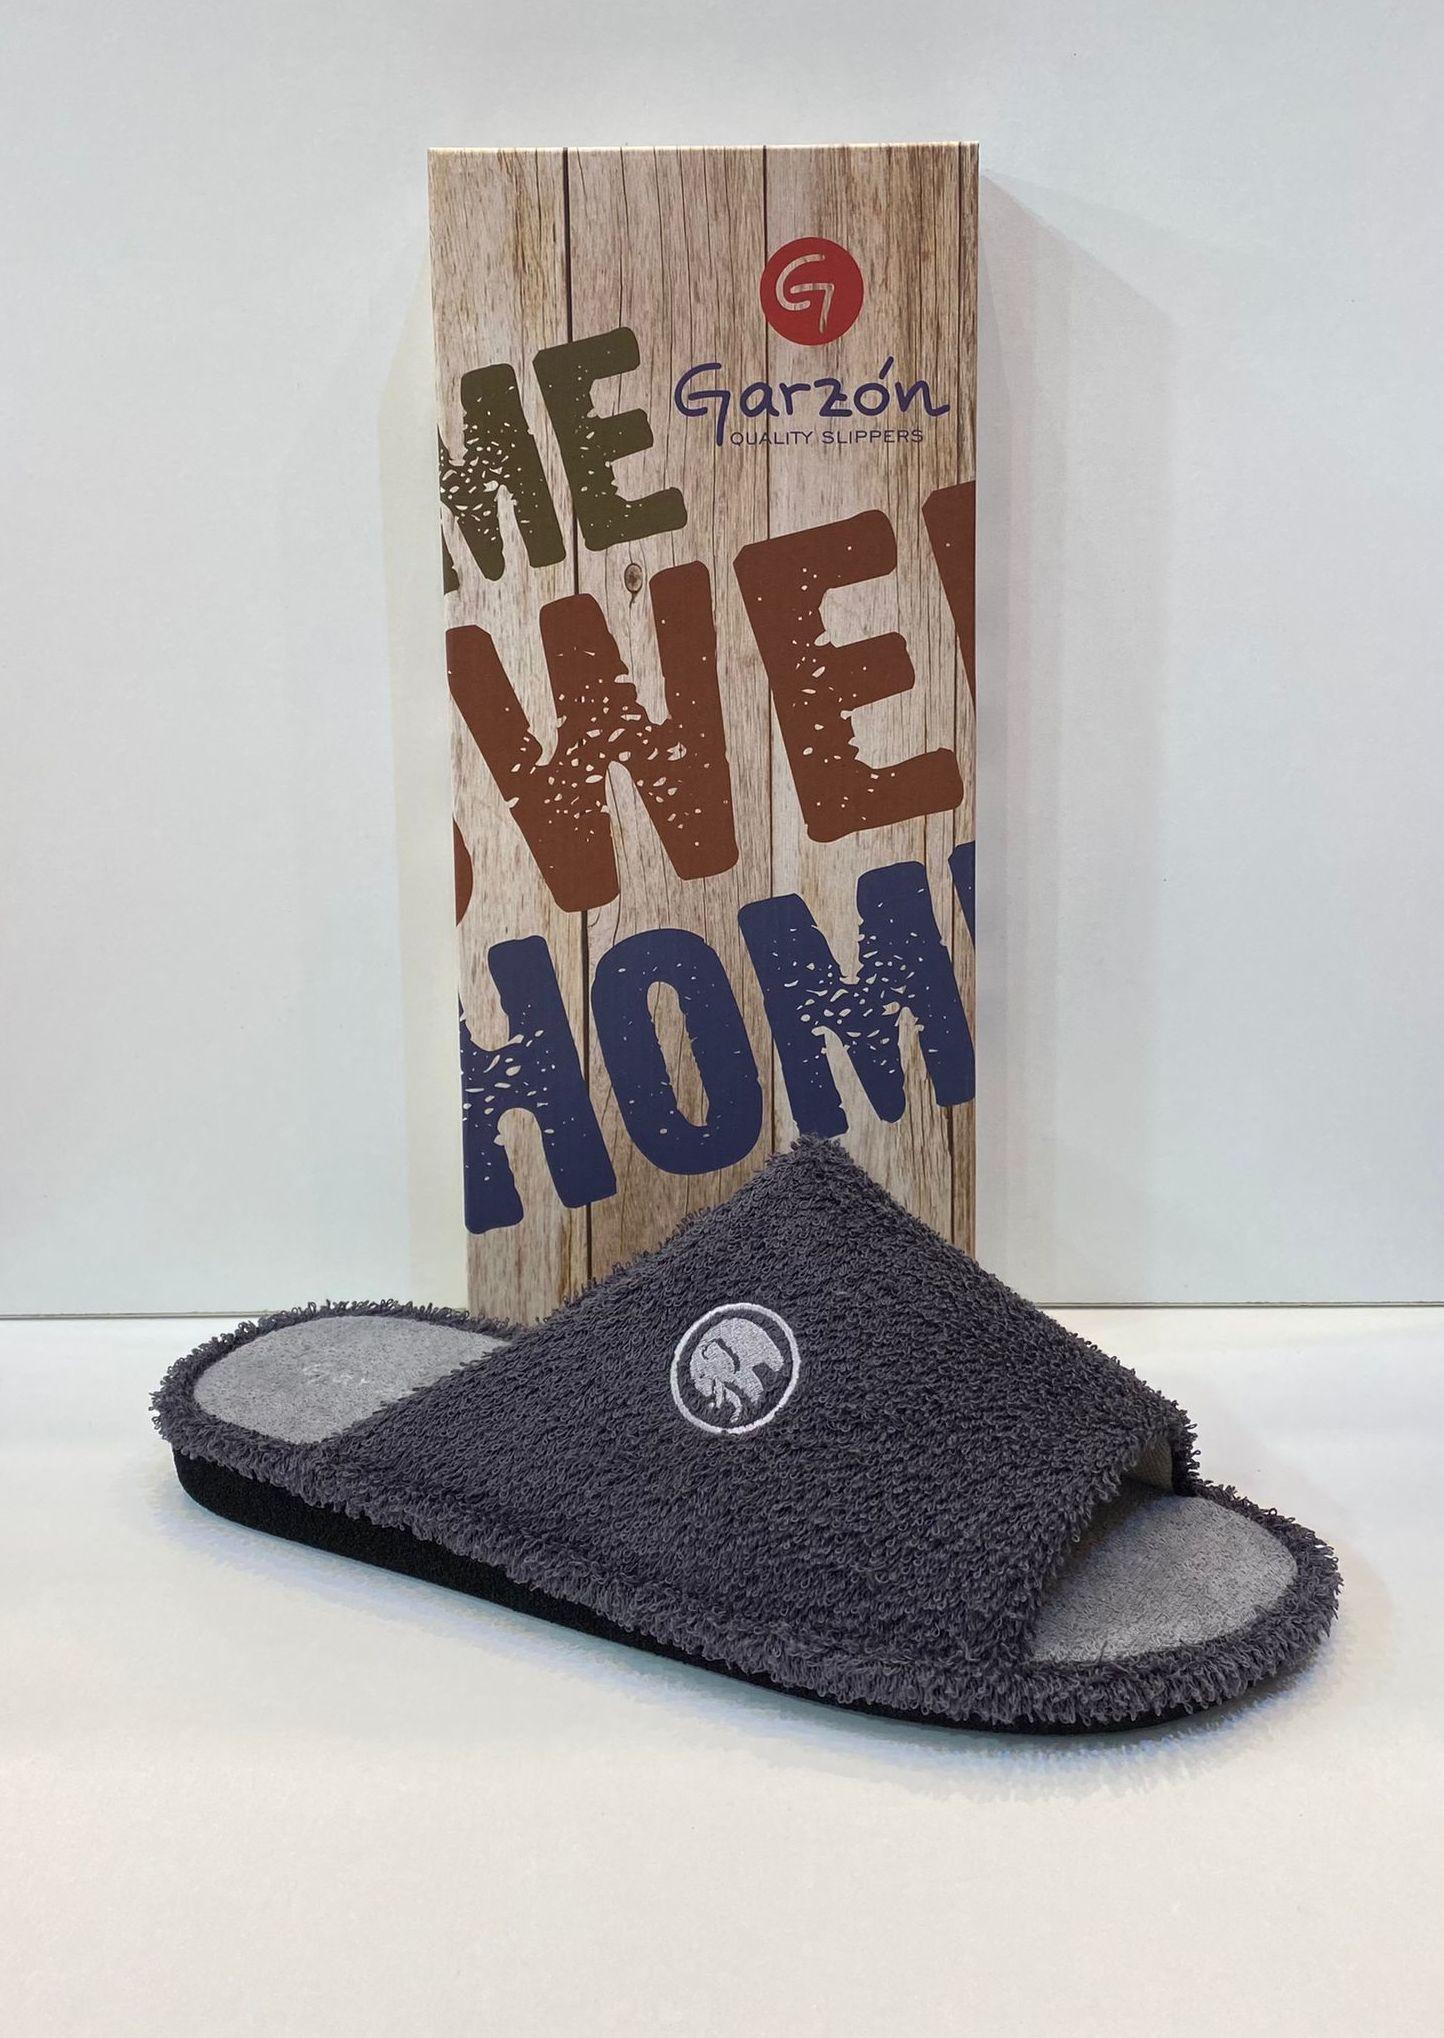 Espardenya d'home, de la marca Garzón, de fibra de bambú antialèrgica, sola de microporós especial parquet 26.50€ www.calzadosllinas.es